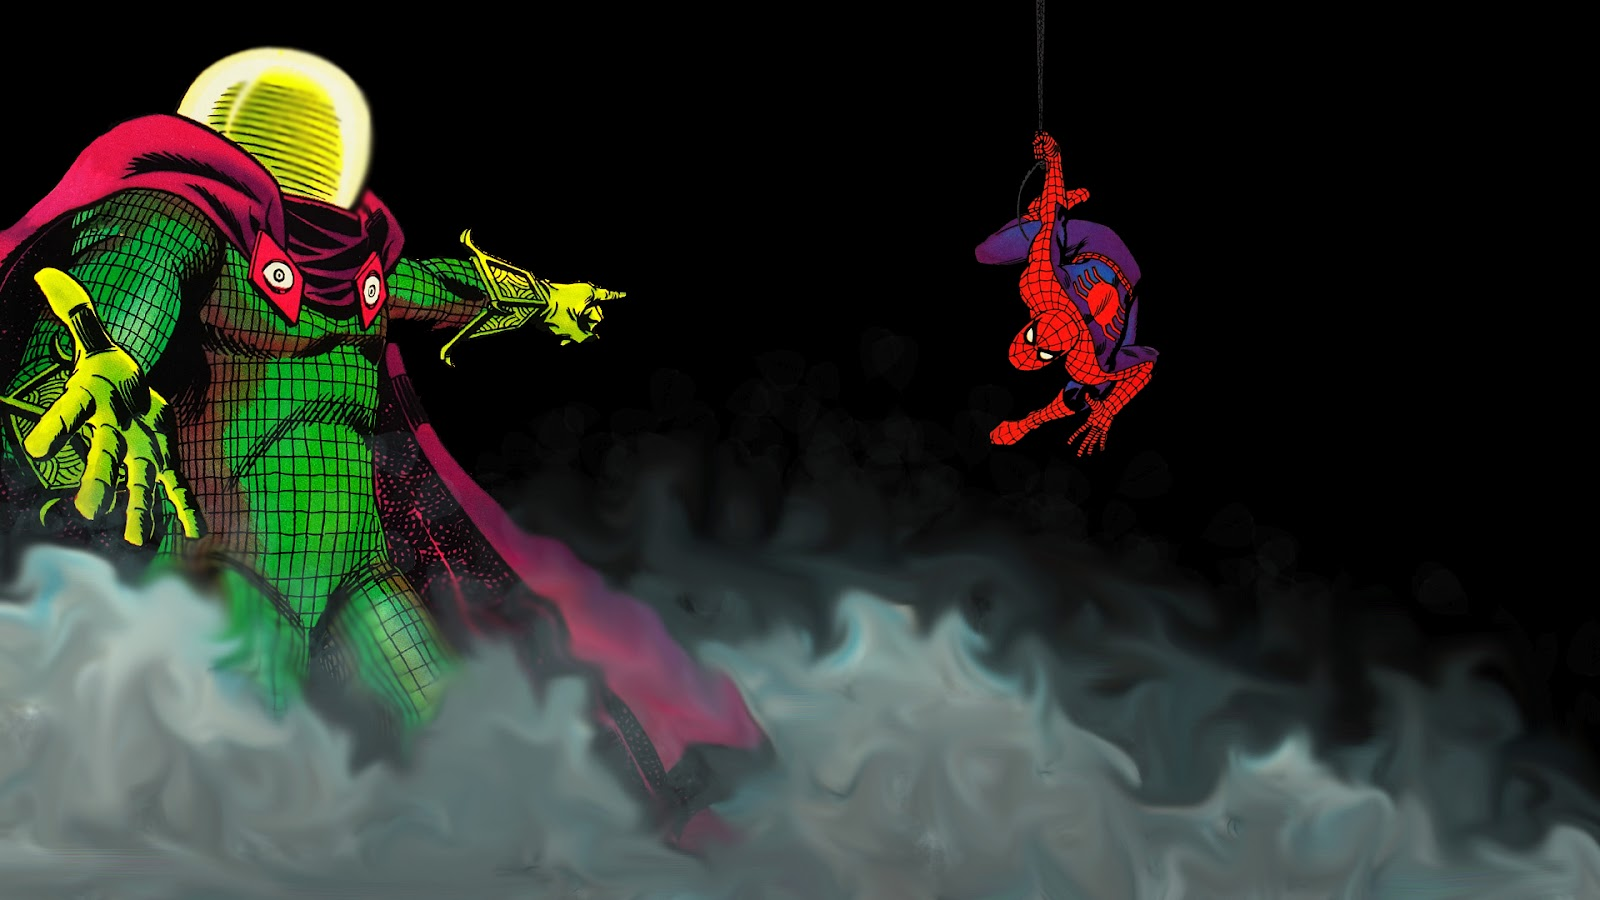 Amazing Wallpaper Marvel Halloween - Mysterio+Wallpaper  Image_134020.jpg